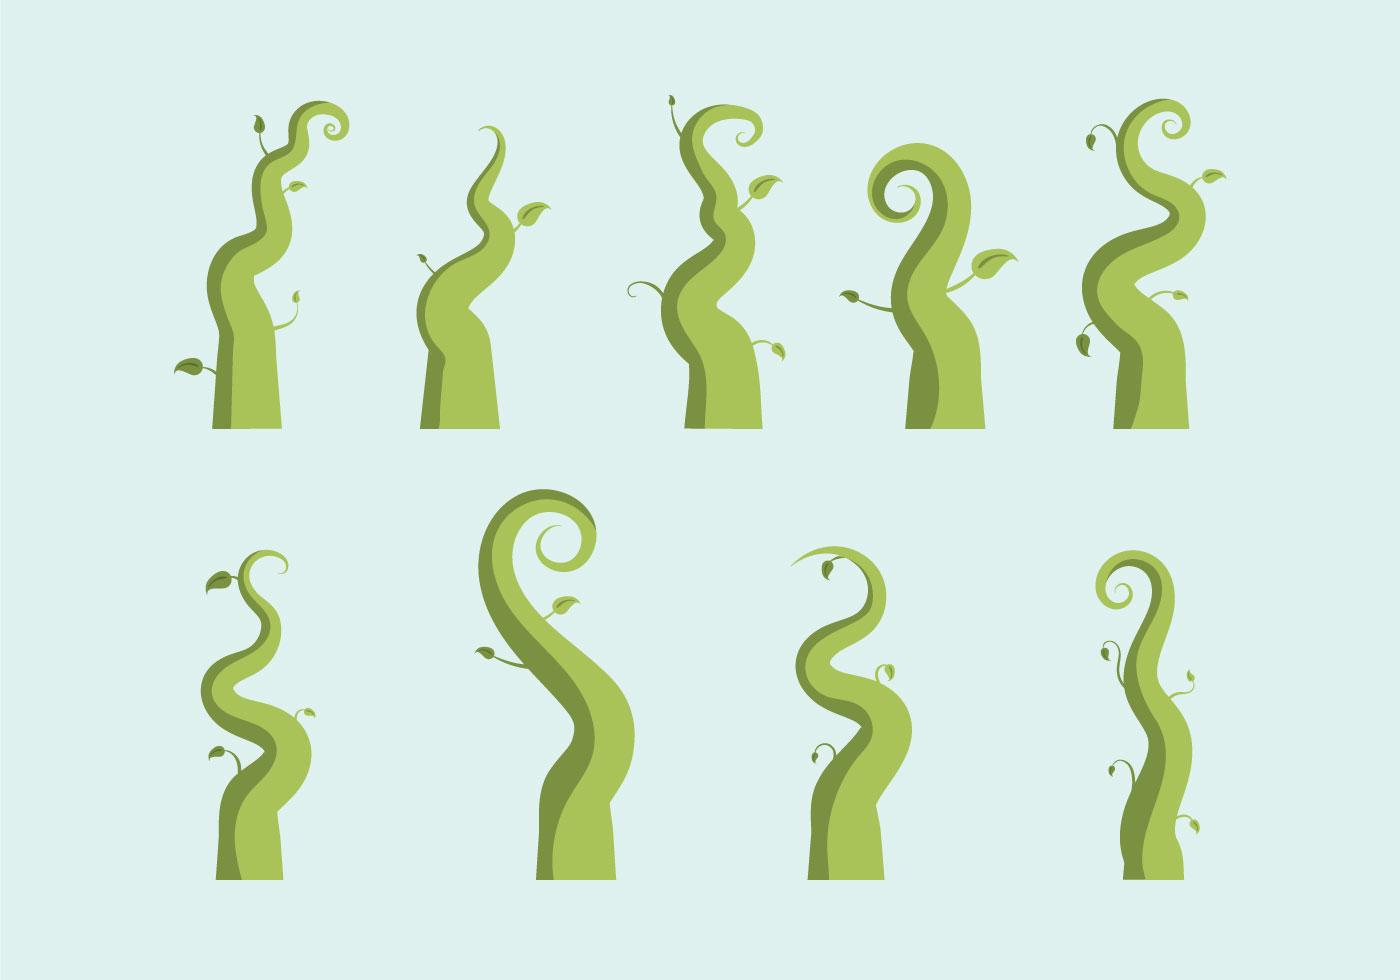 Free Beanstalk Vector Illustration Download Free Vector